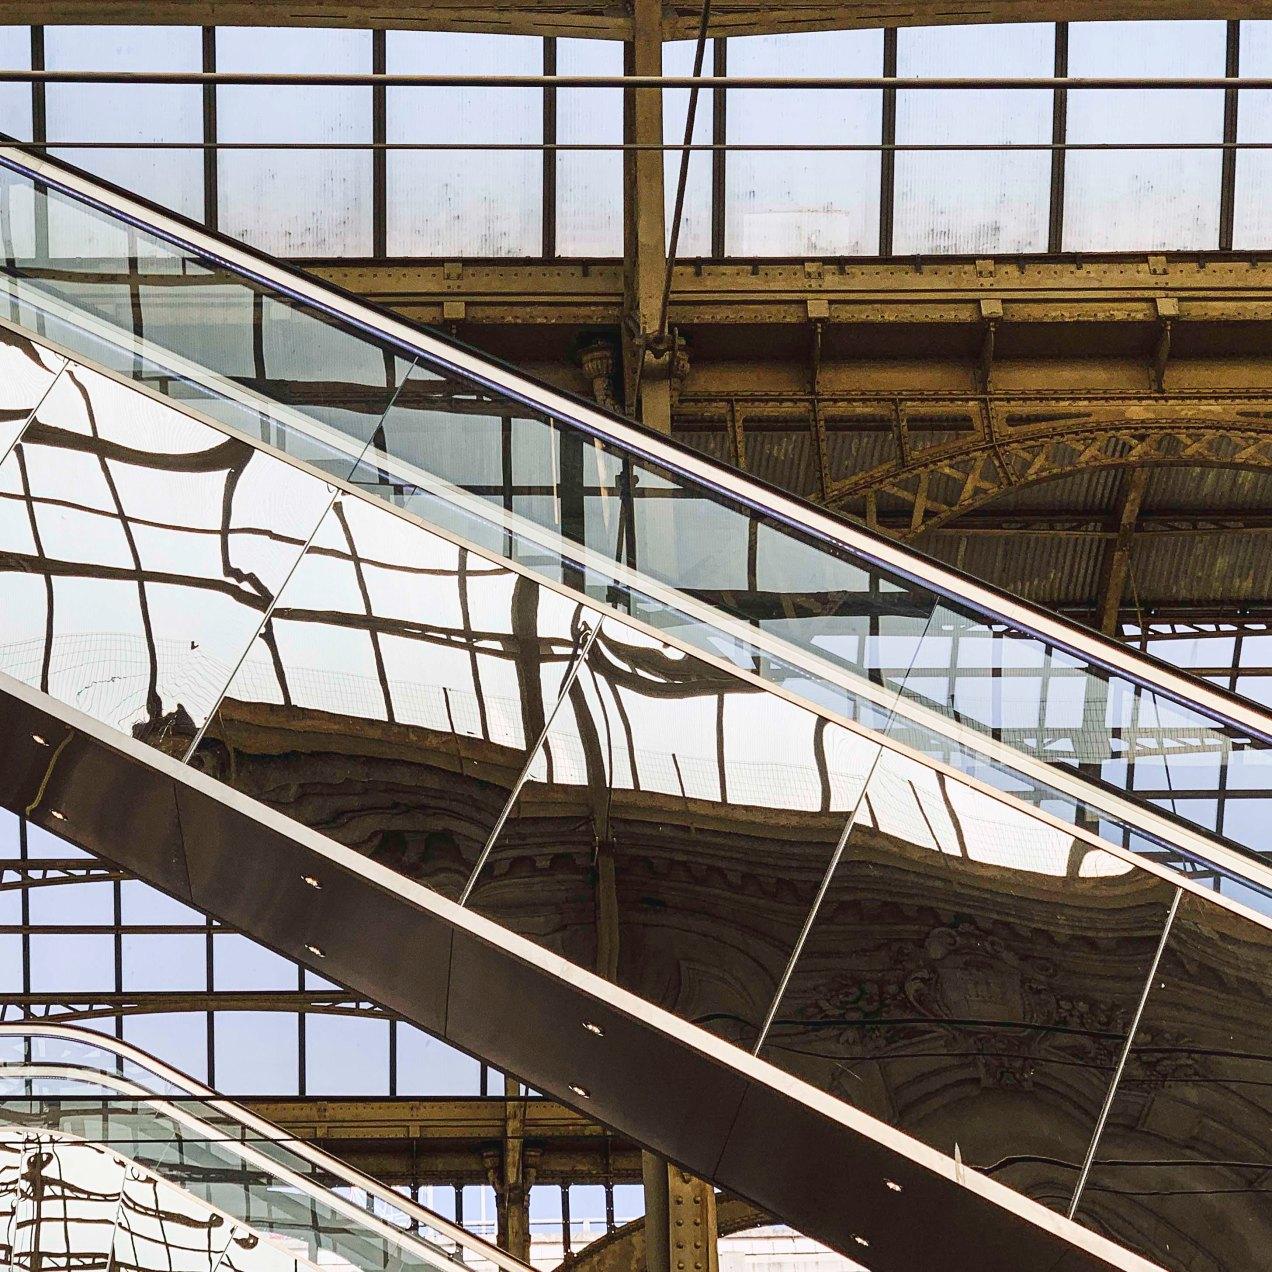 Gare de Nice, gildalliere, 2019